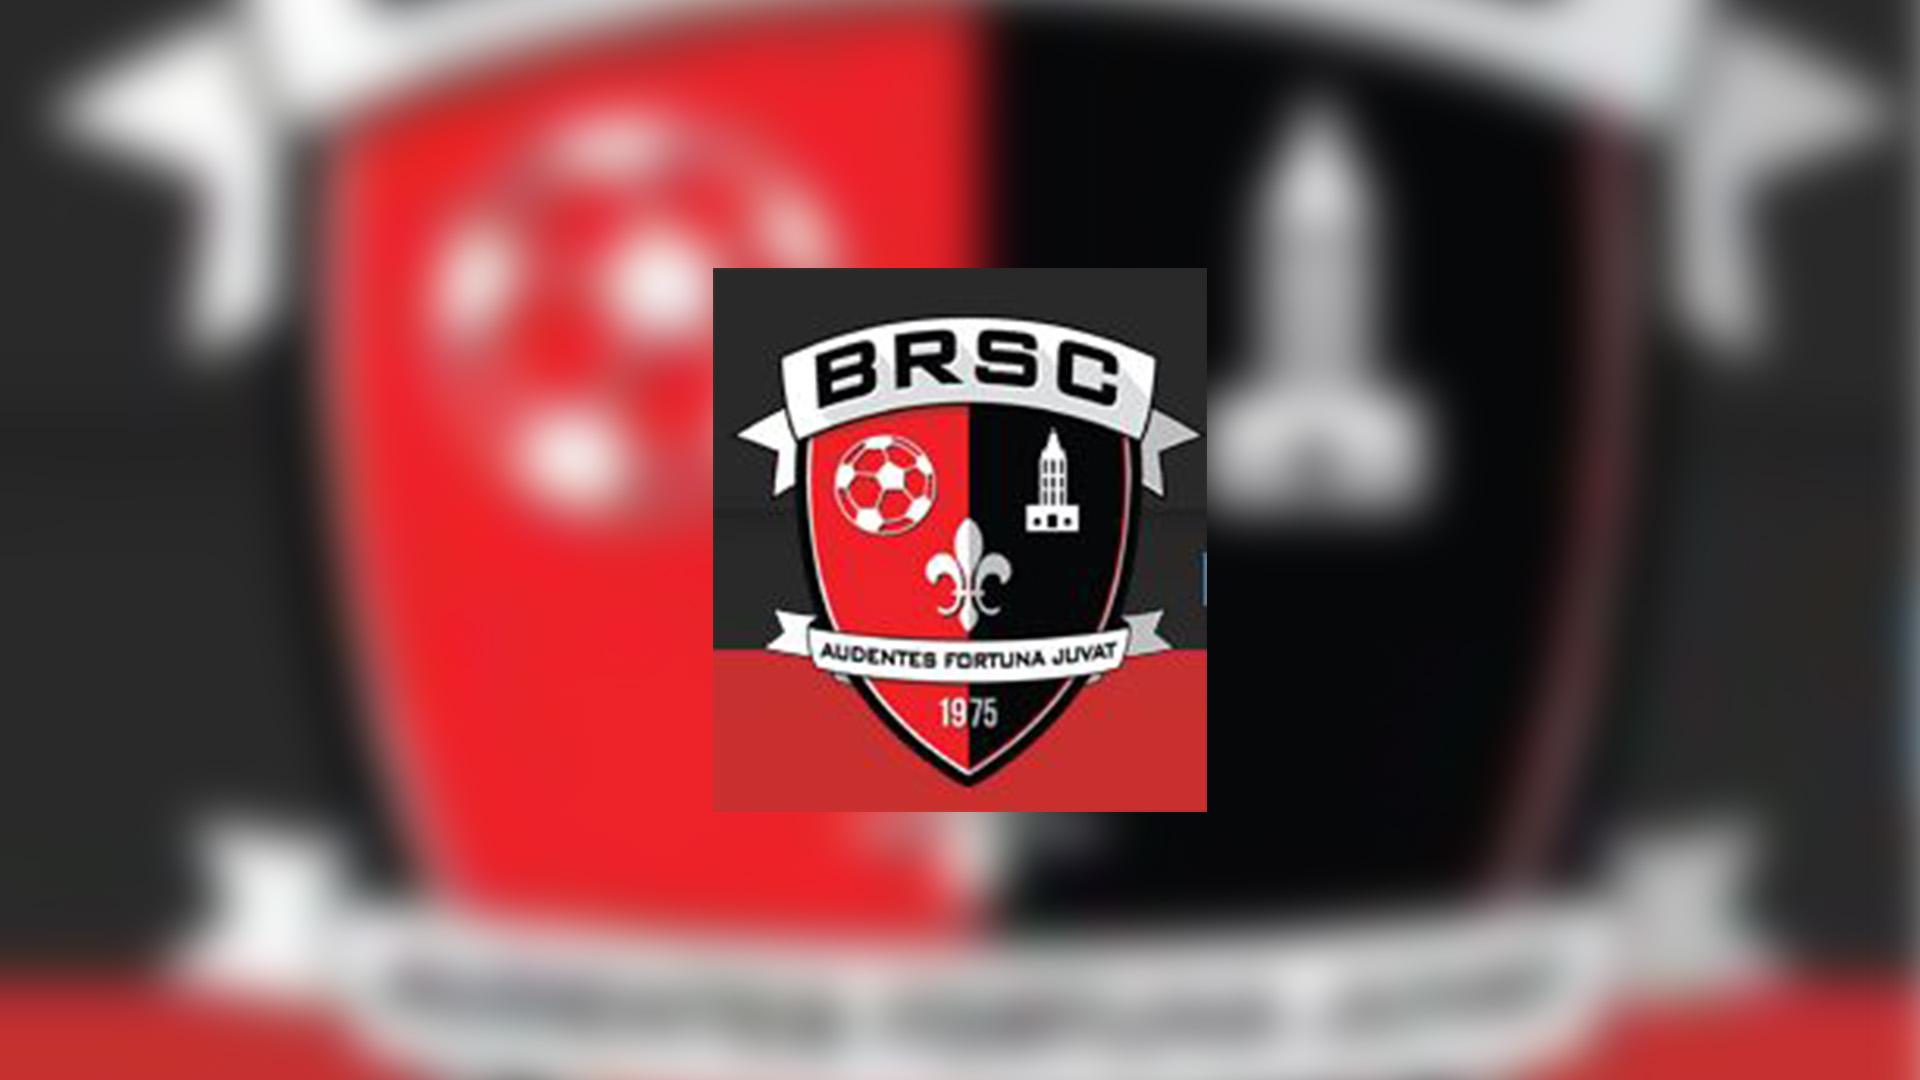 BRSC_1560365273116.JPG